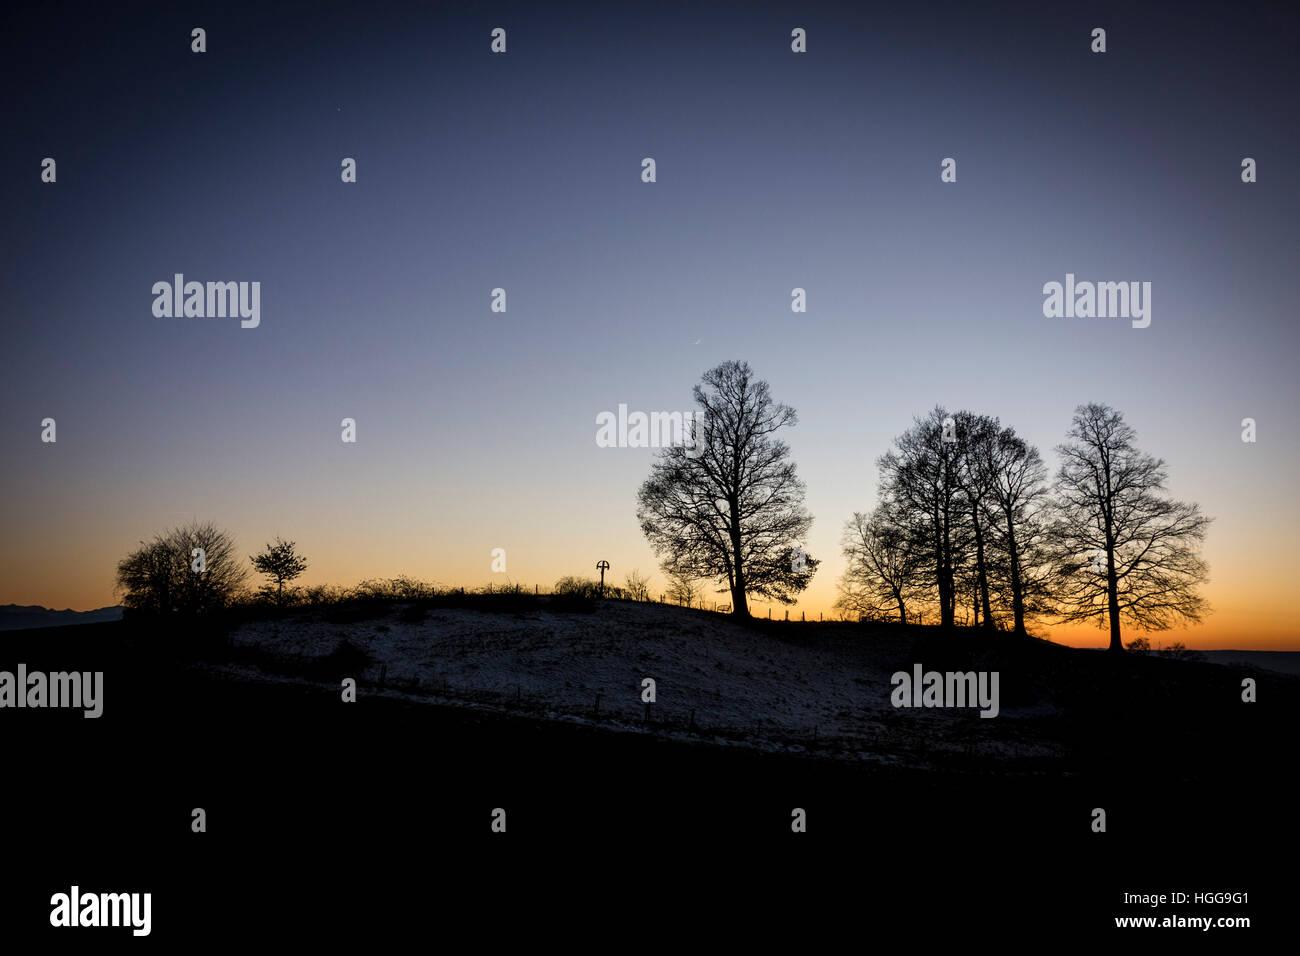 Dawn, Bavarian Landscape Silhouette - Stock Image